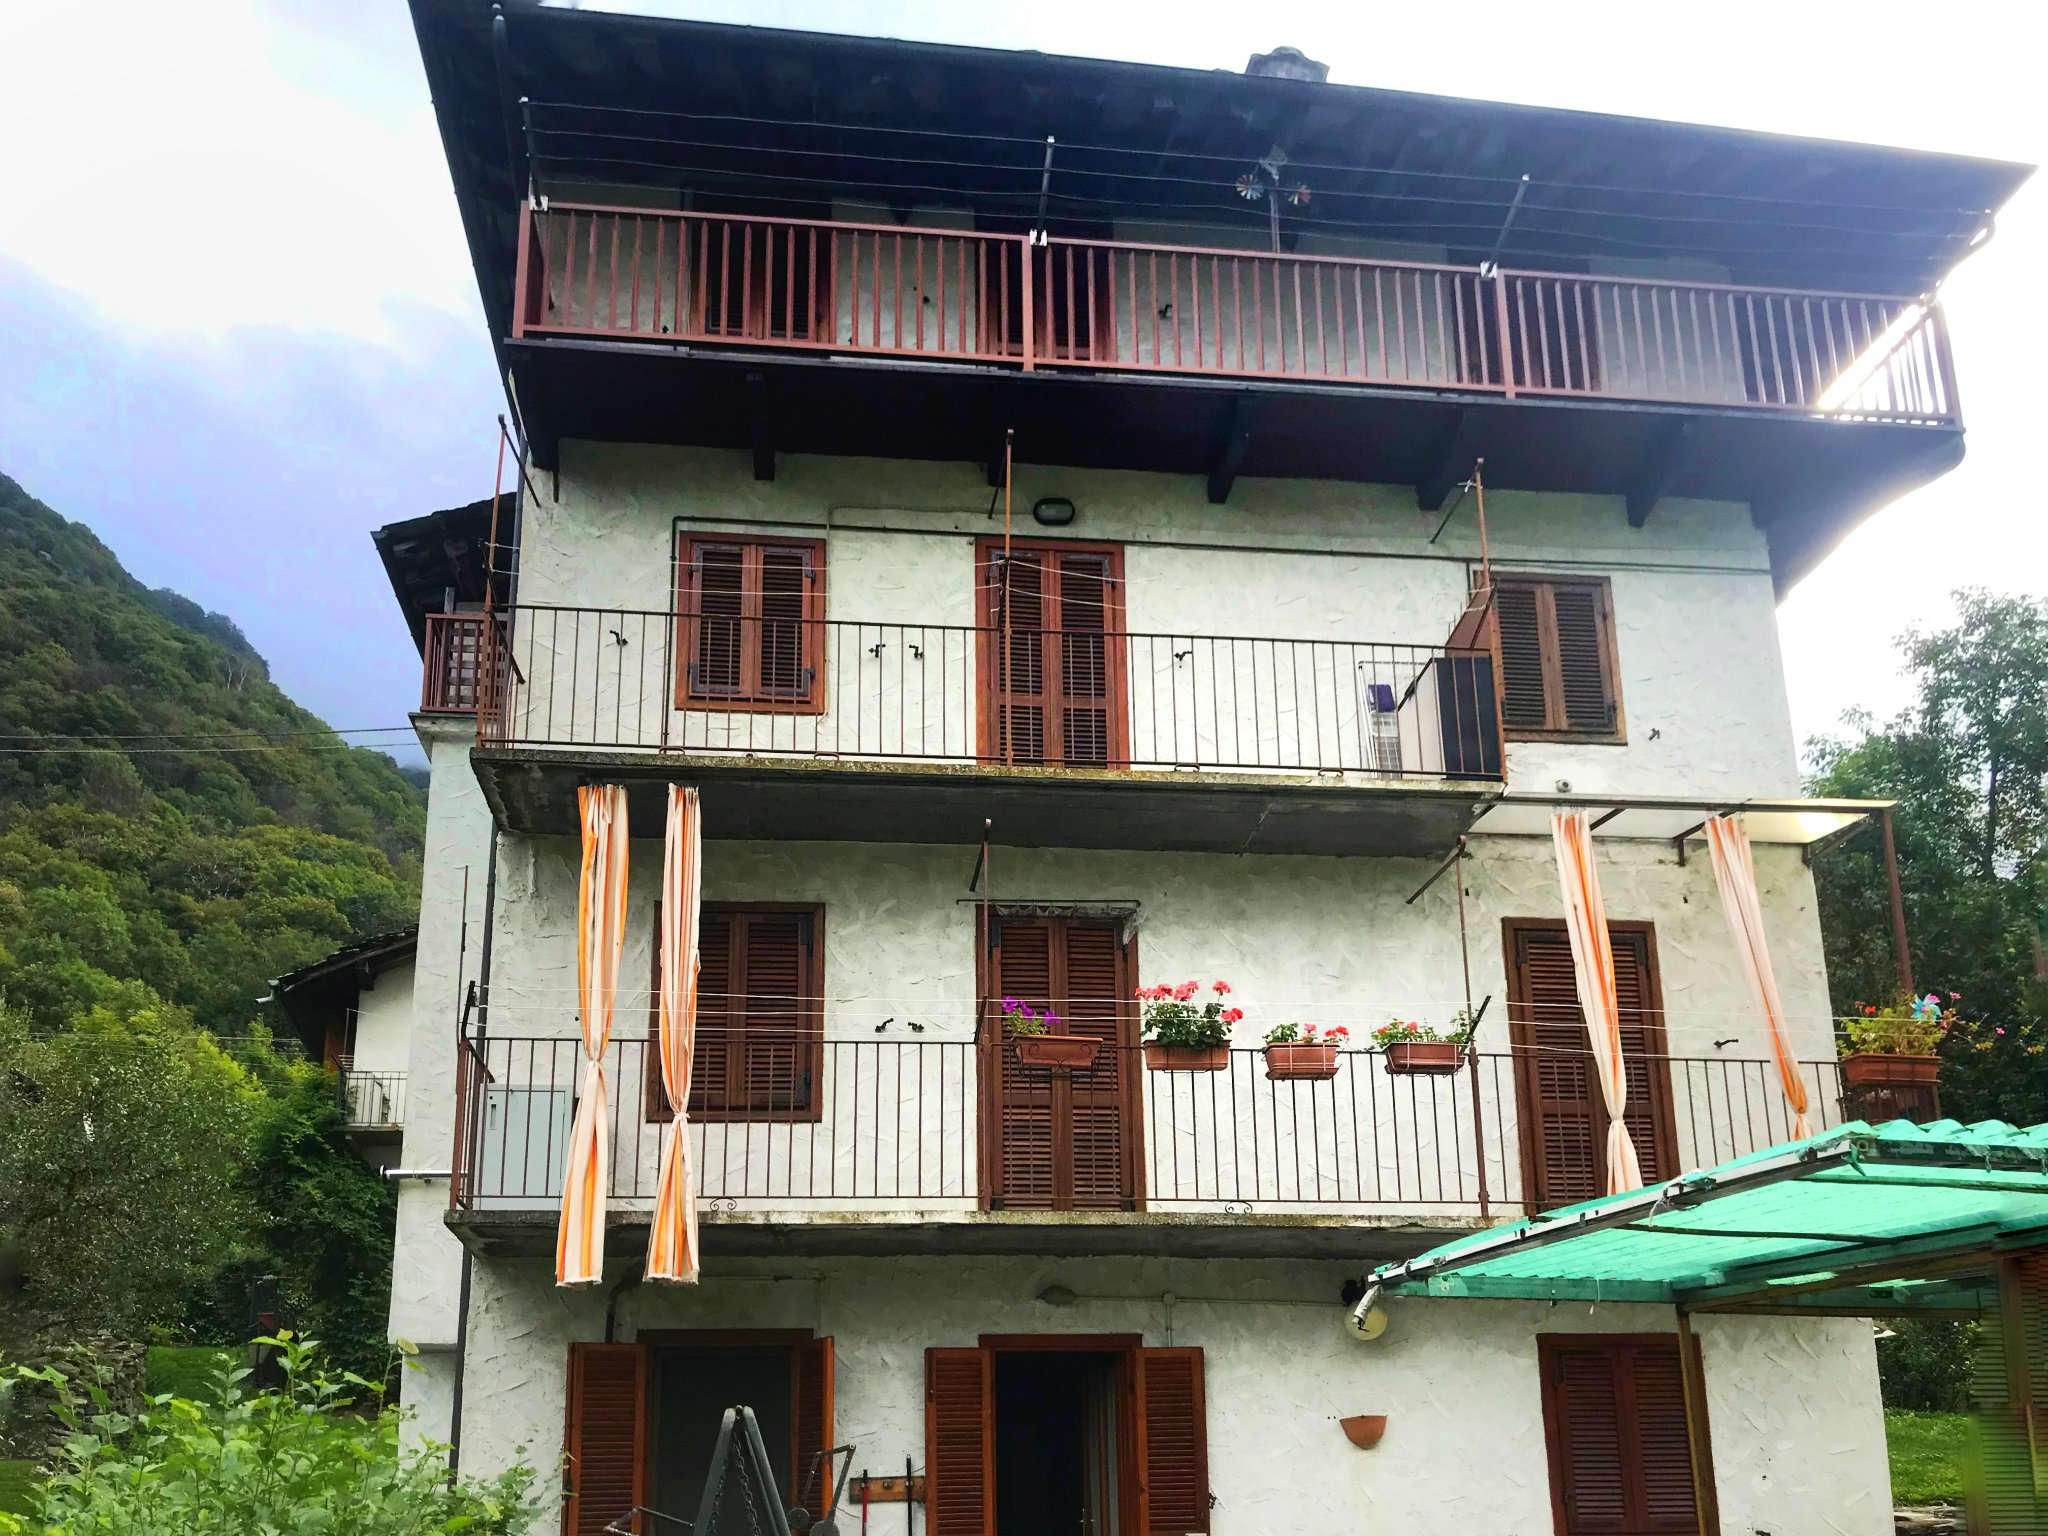 Foto 1 di Appartamento borgata bruschi 20, frazione Bruschi, Cantoira